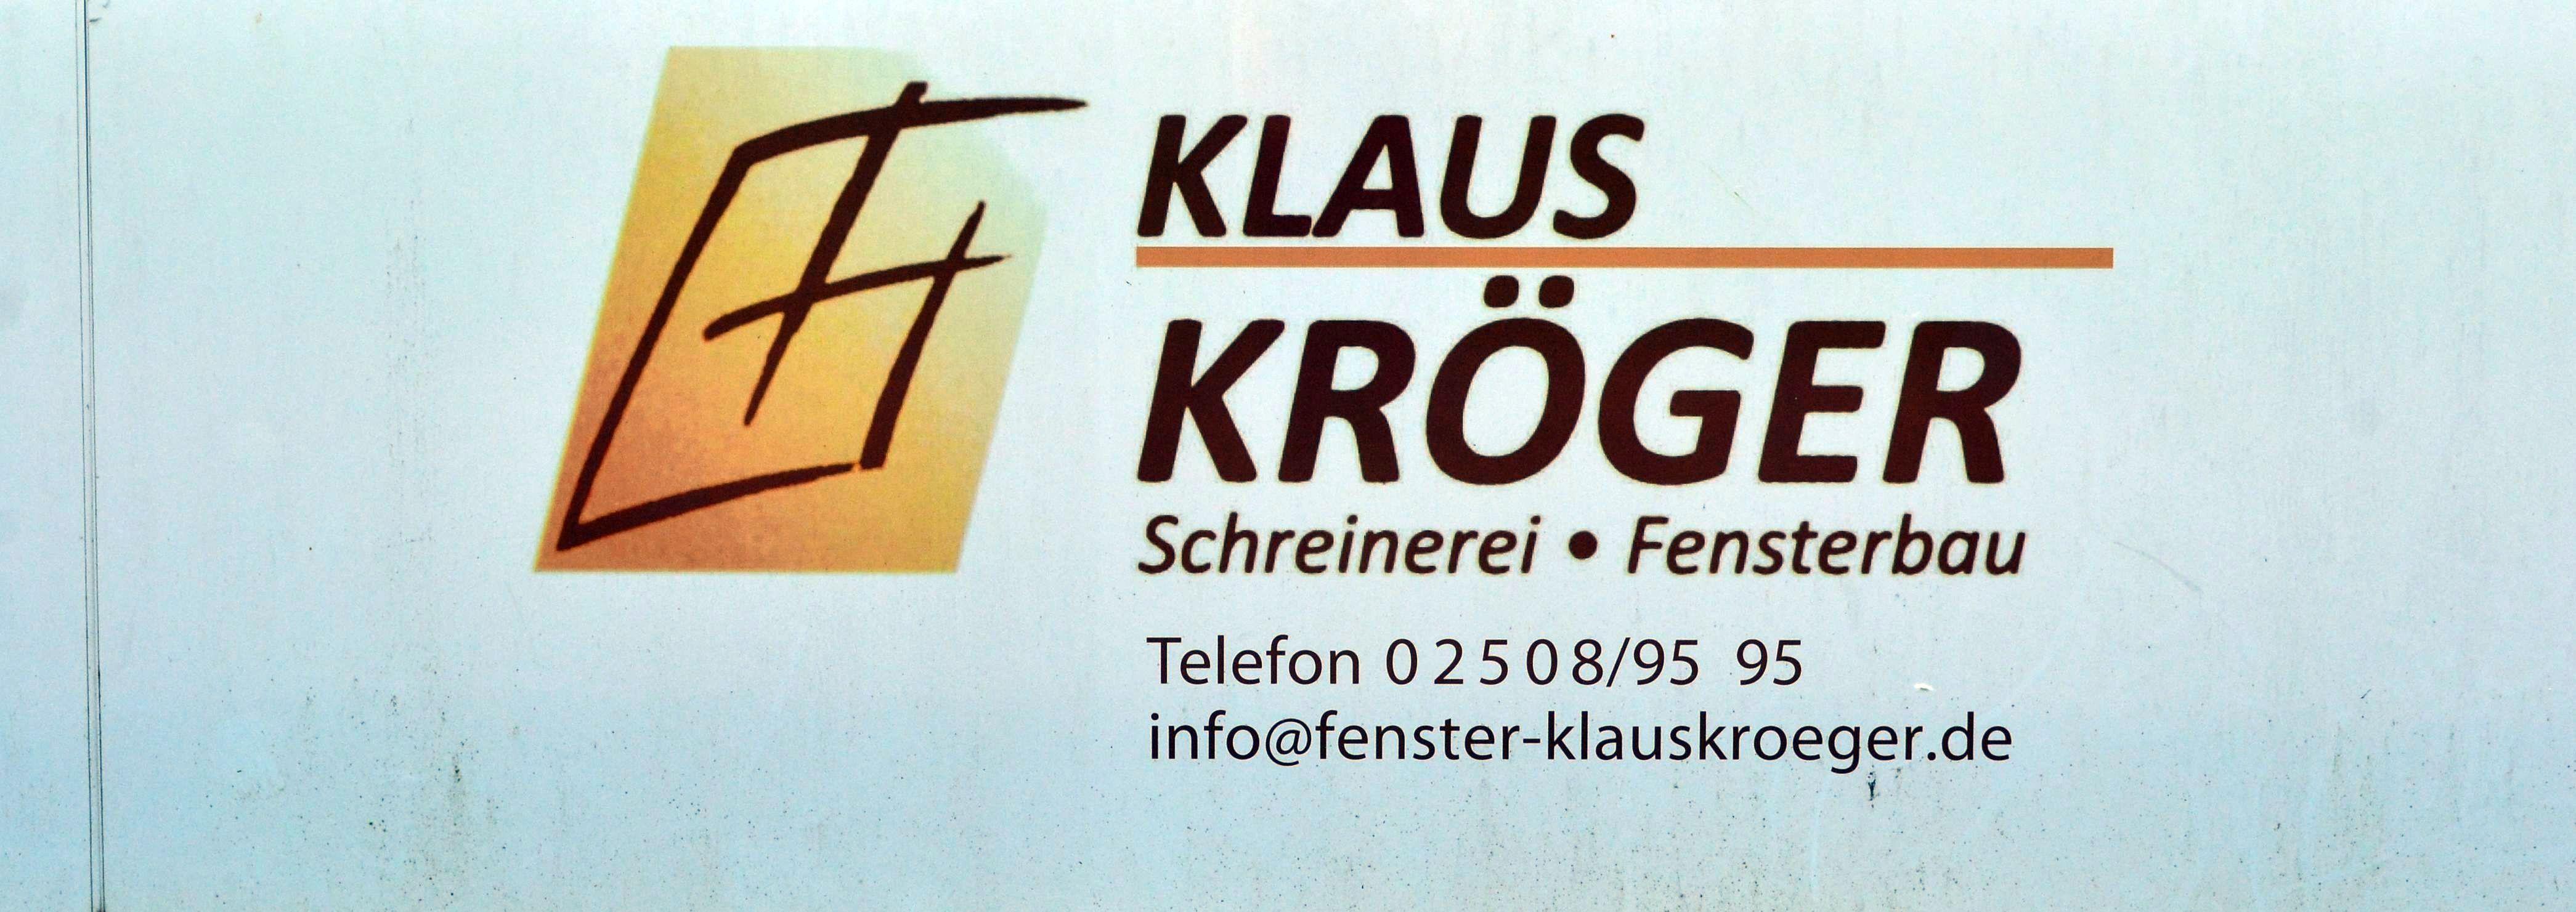 Unsere Forderer Sv Drensteinfurtsv Drensteinfurt